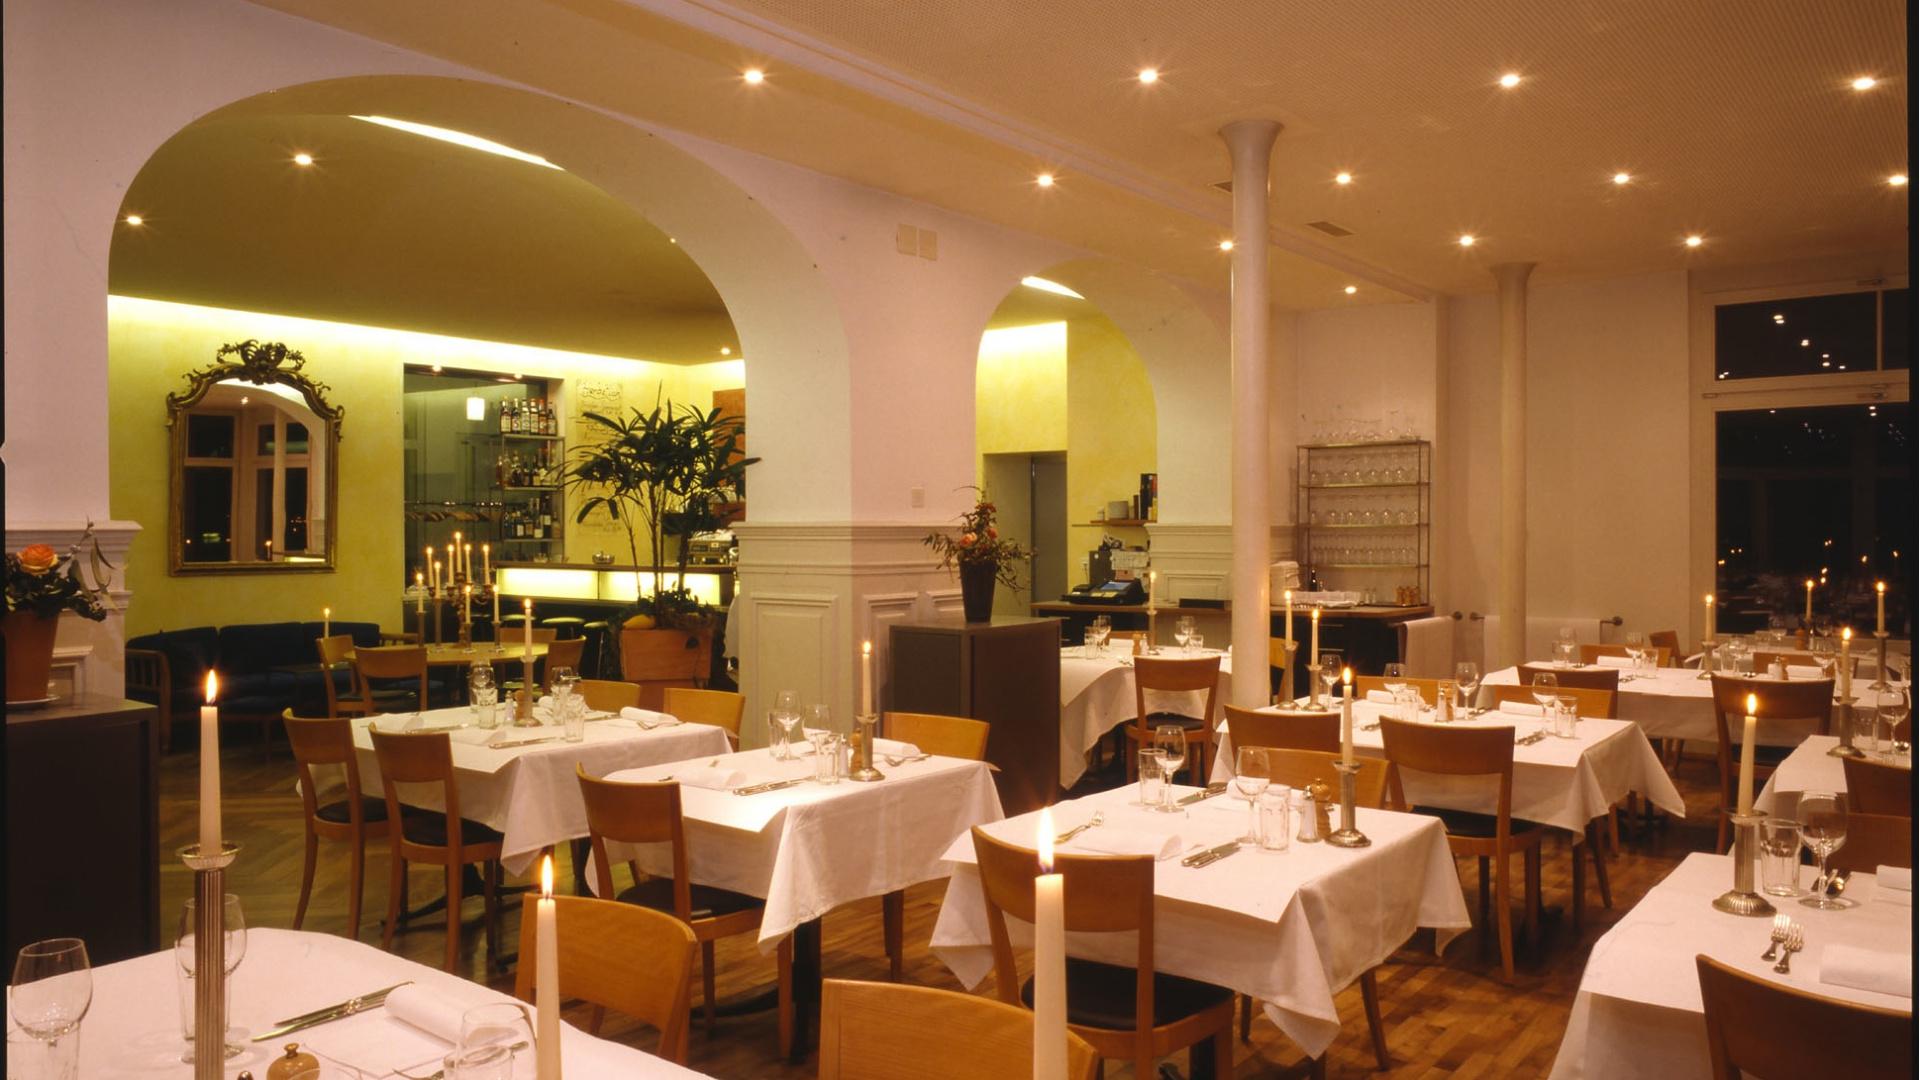 Restaurant Veranda Bern Tourism